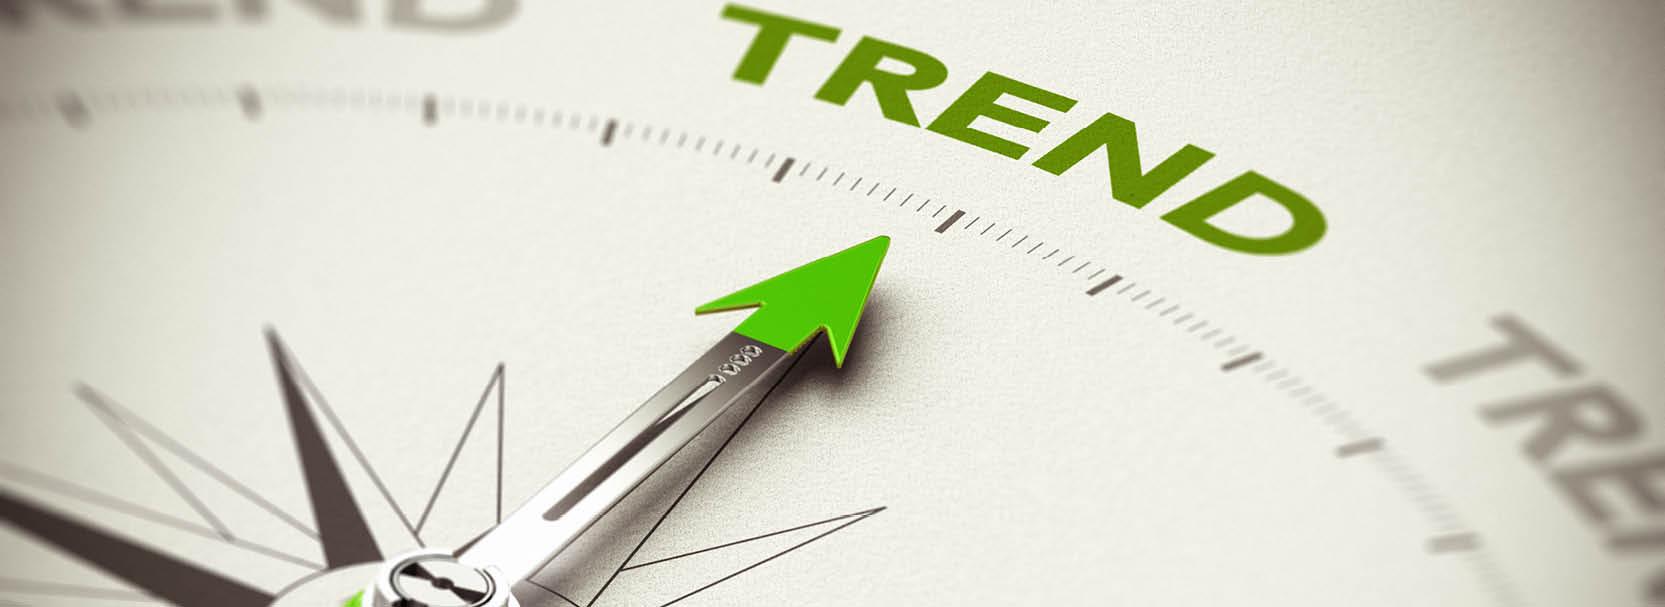 Trend, ökologisch